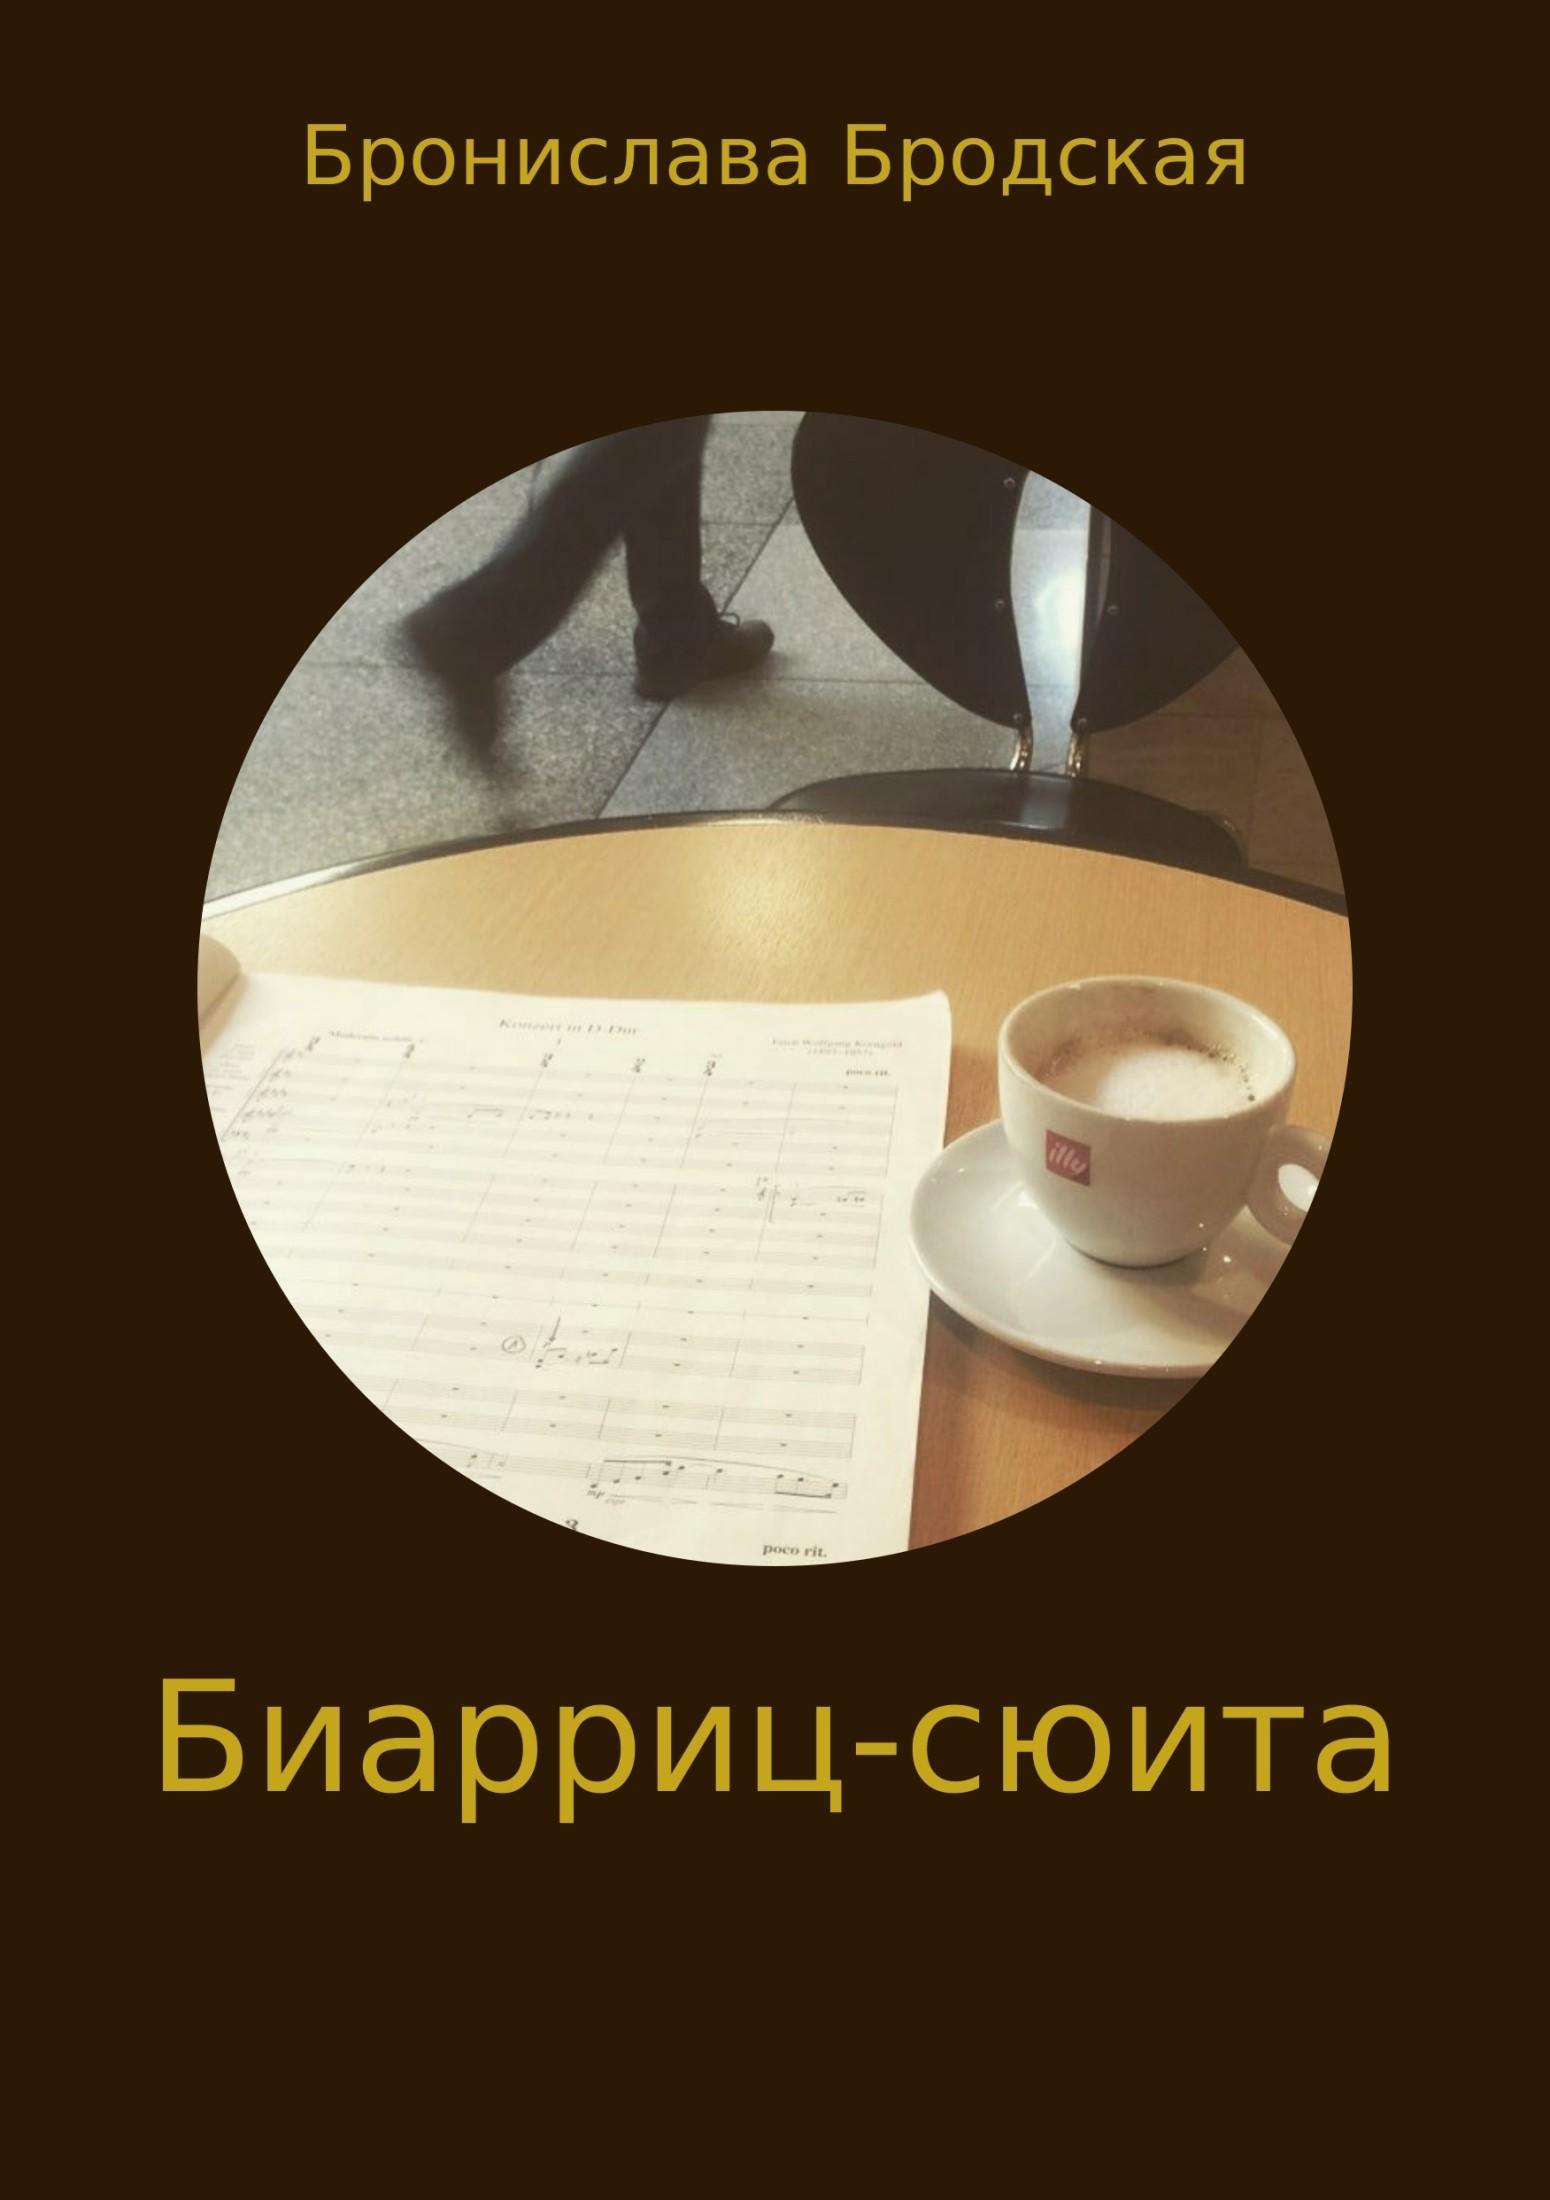 Бронислава Бродская Биарриц-сюита